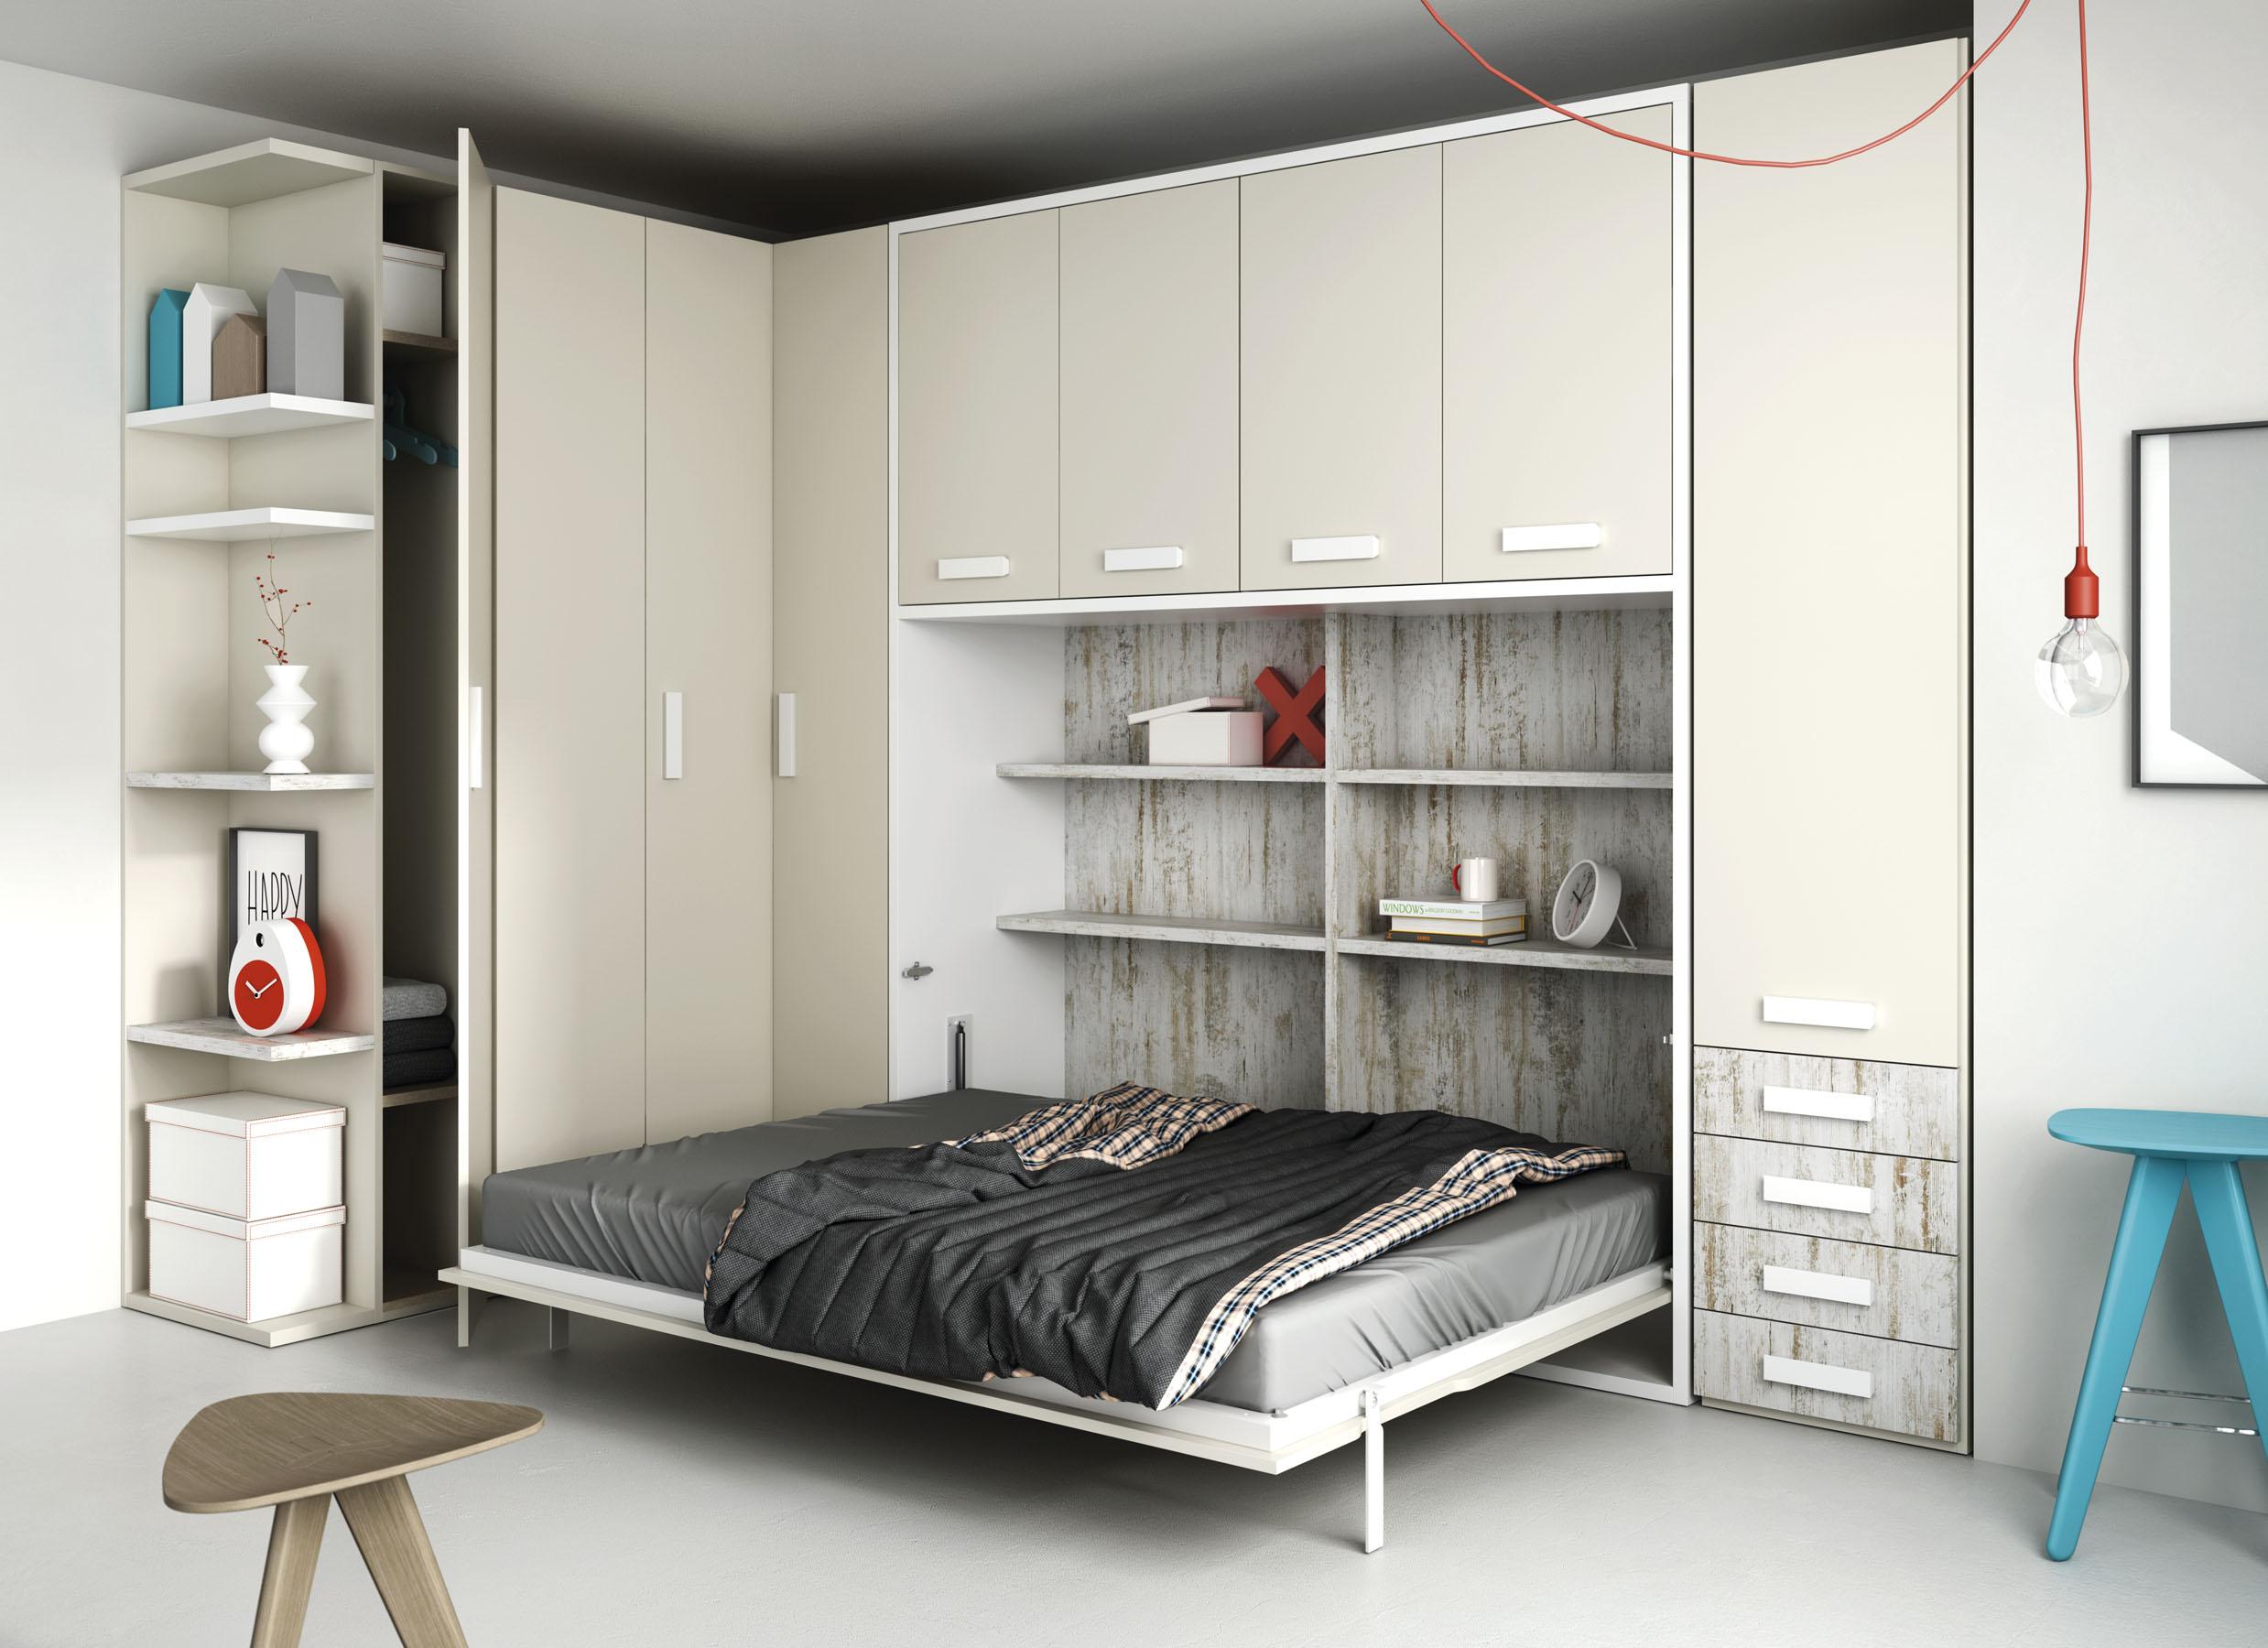 Sistemas abatibles qb tegar for Muebles cama plegables para salon